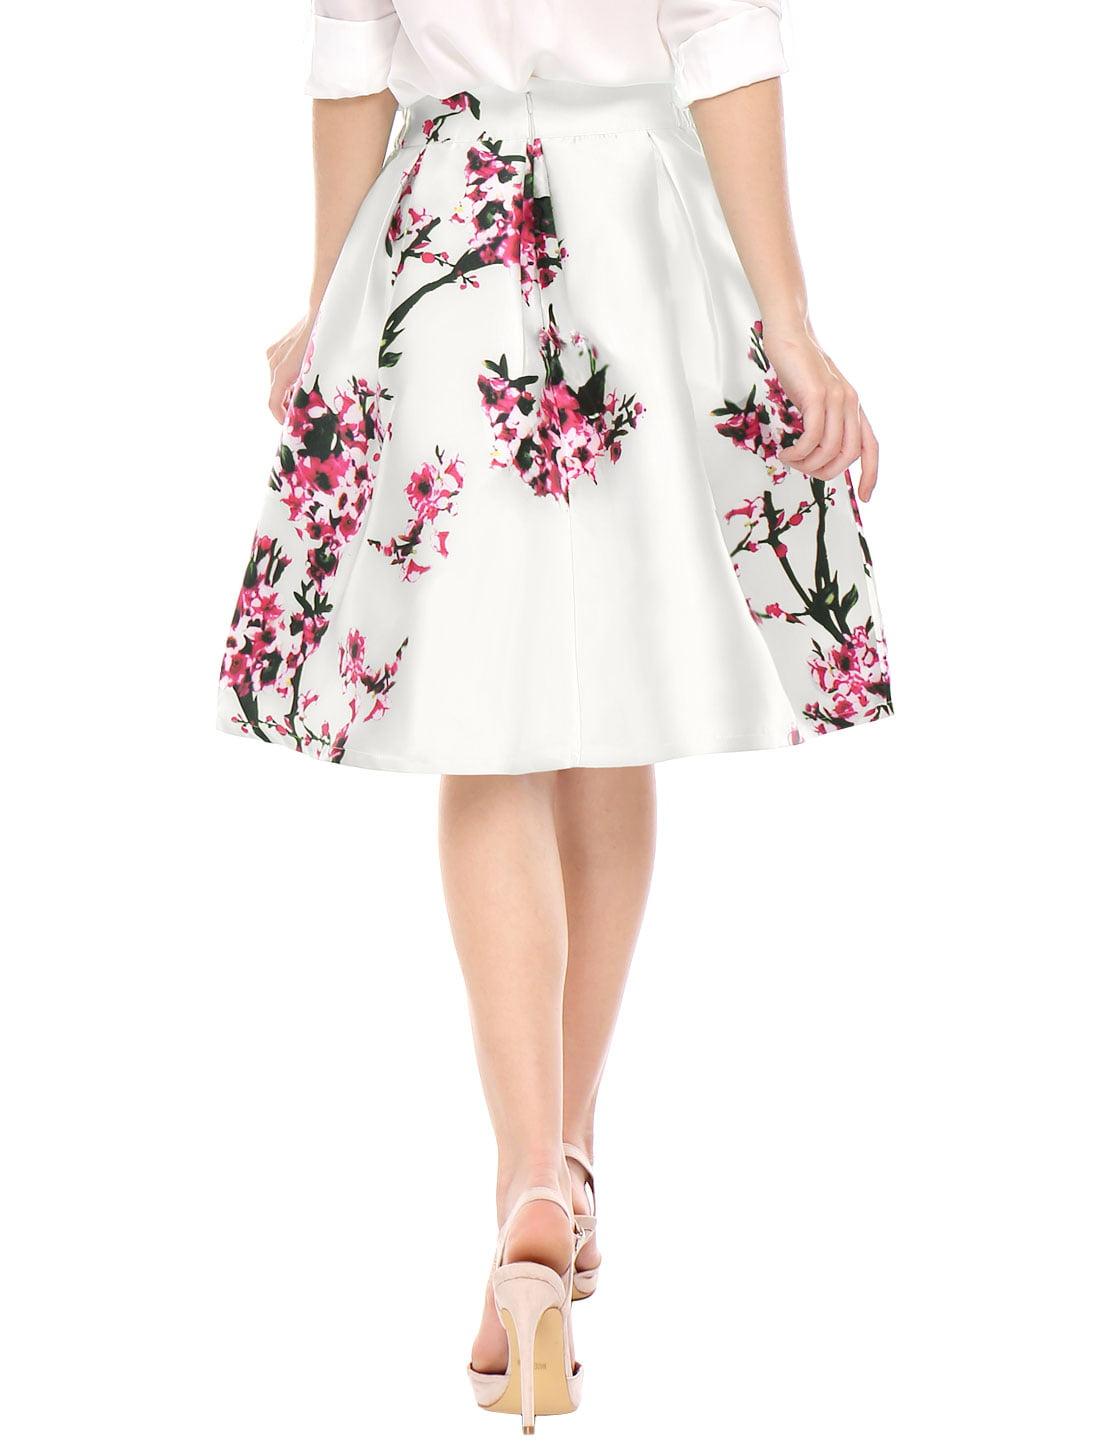 Women's Floral Prints High Waist Pleated A Line Midi Skirt Dress